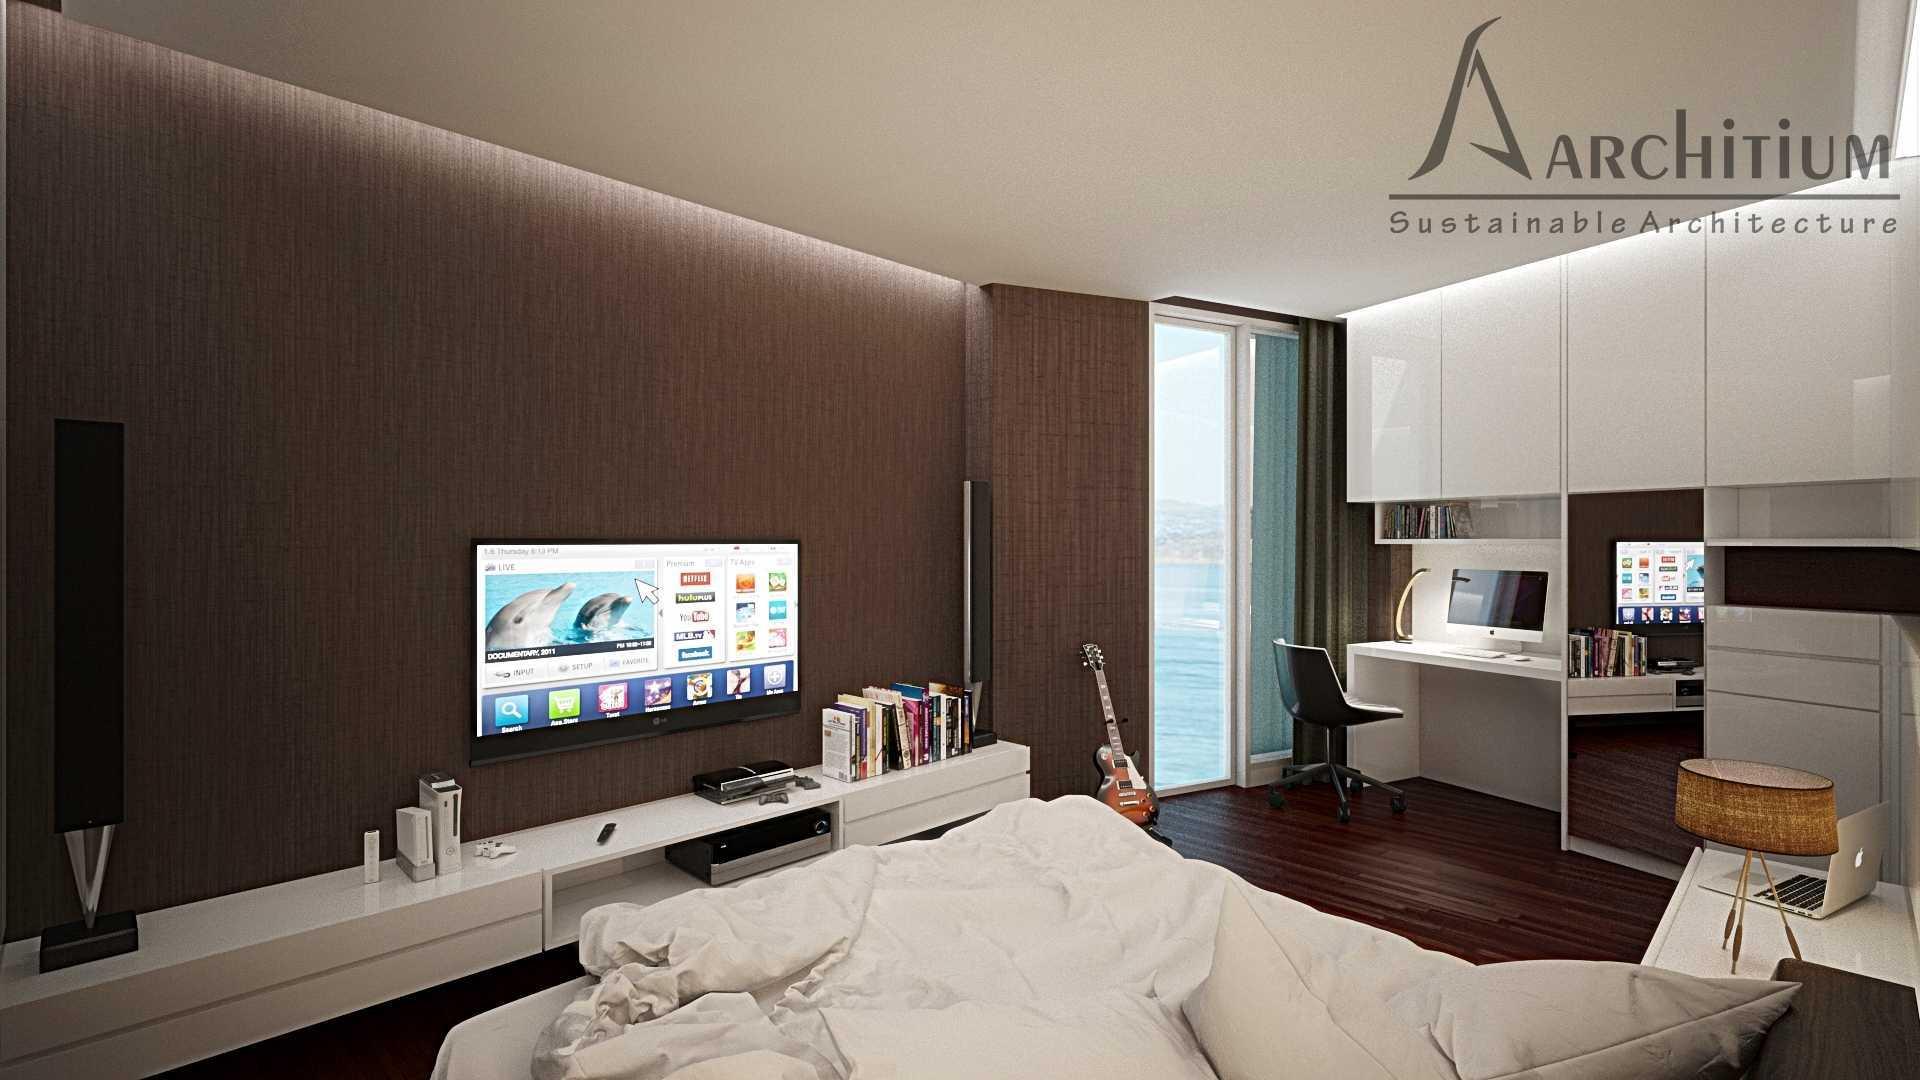 Architium Design Penthouse At Regatta Apartment Regatta Apartment, Jakarta Regatta Apartment, Jakarta Bedroom-A-1 Minimalis,wood  27416